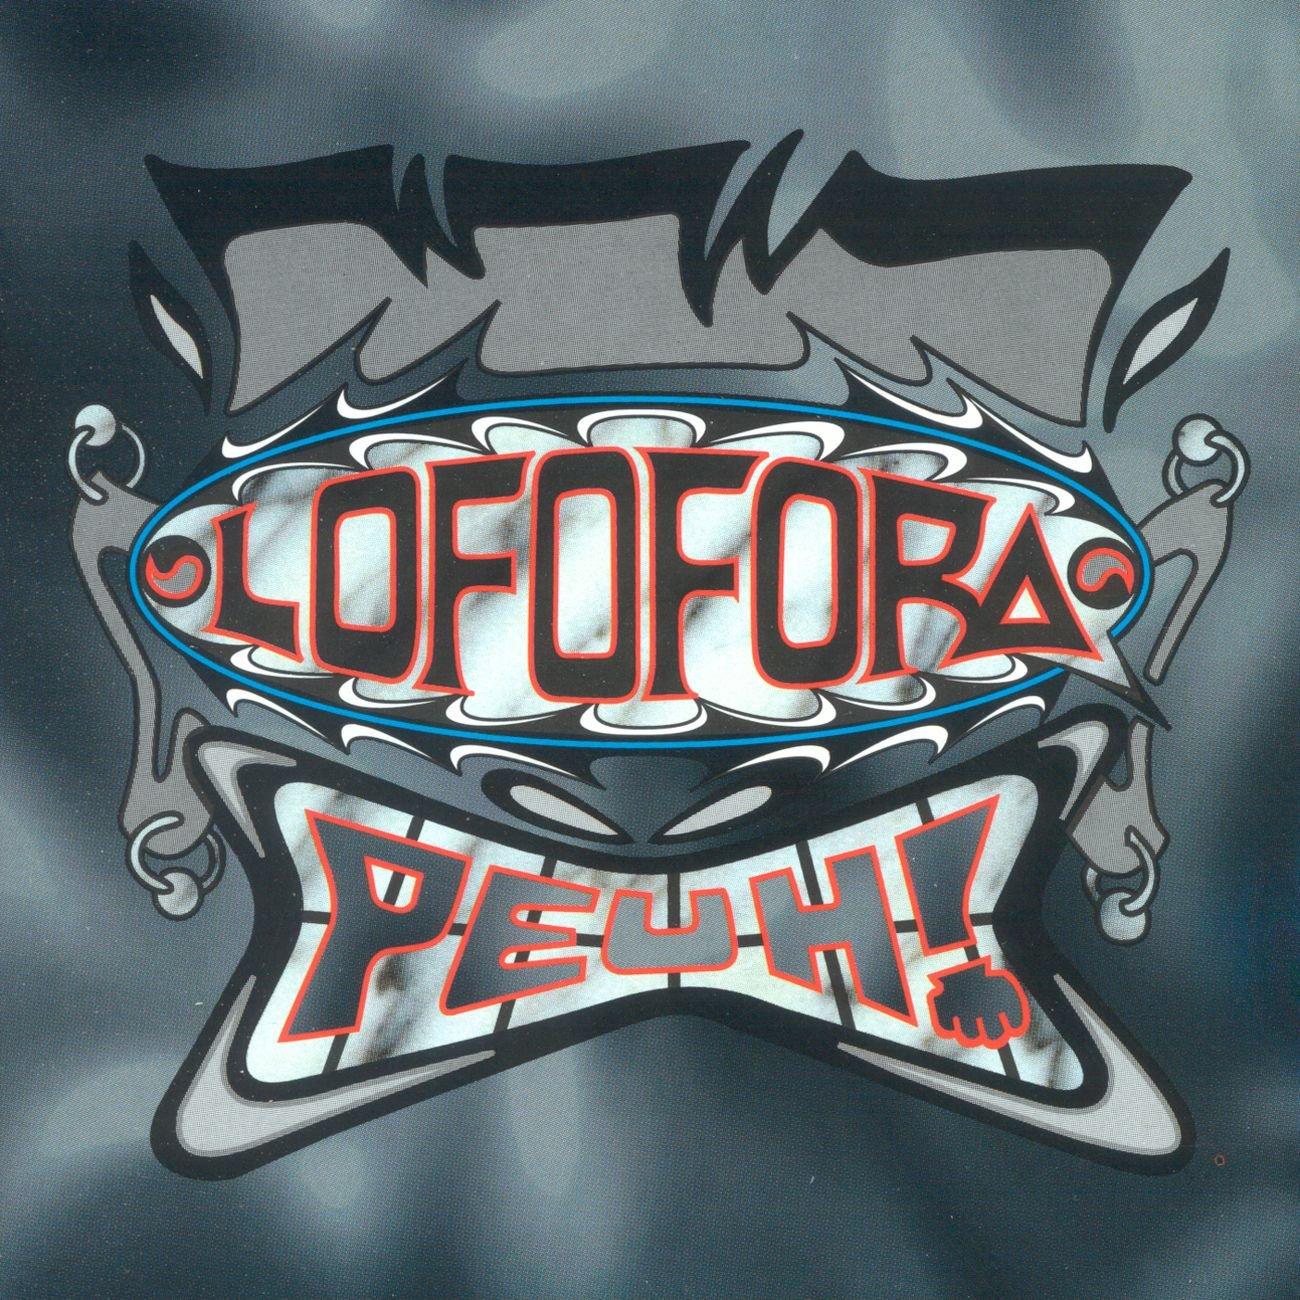 Lofofora - Peuh !